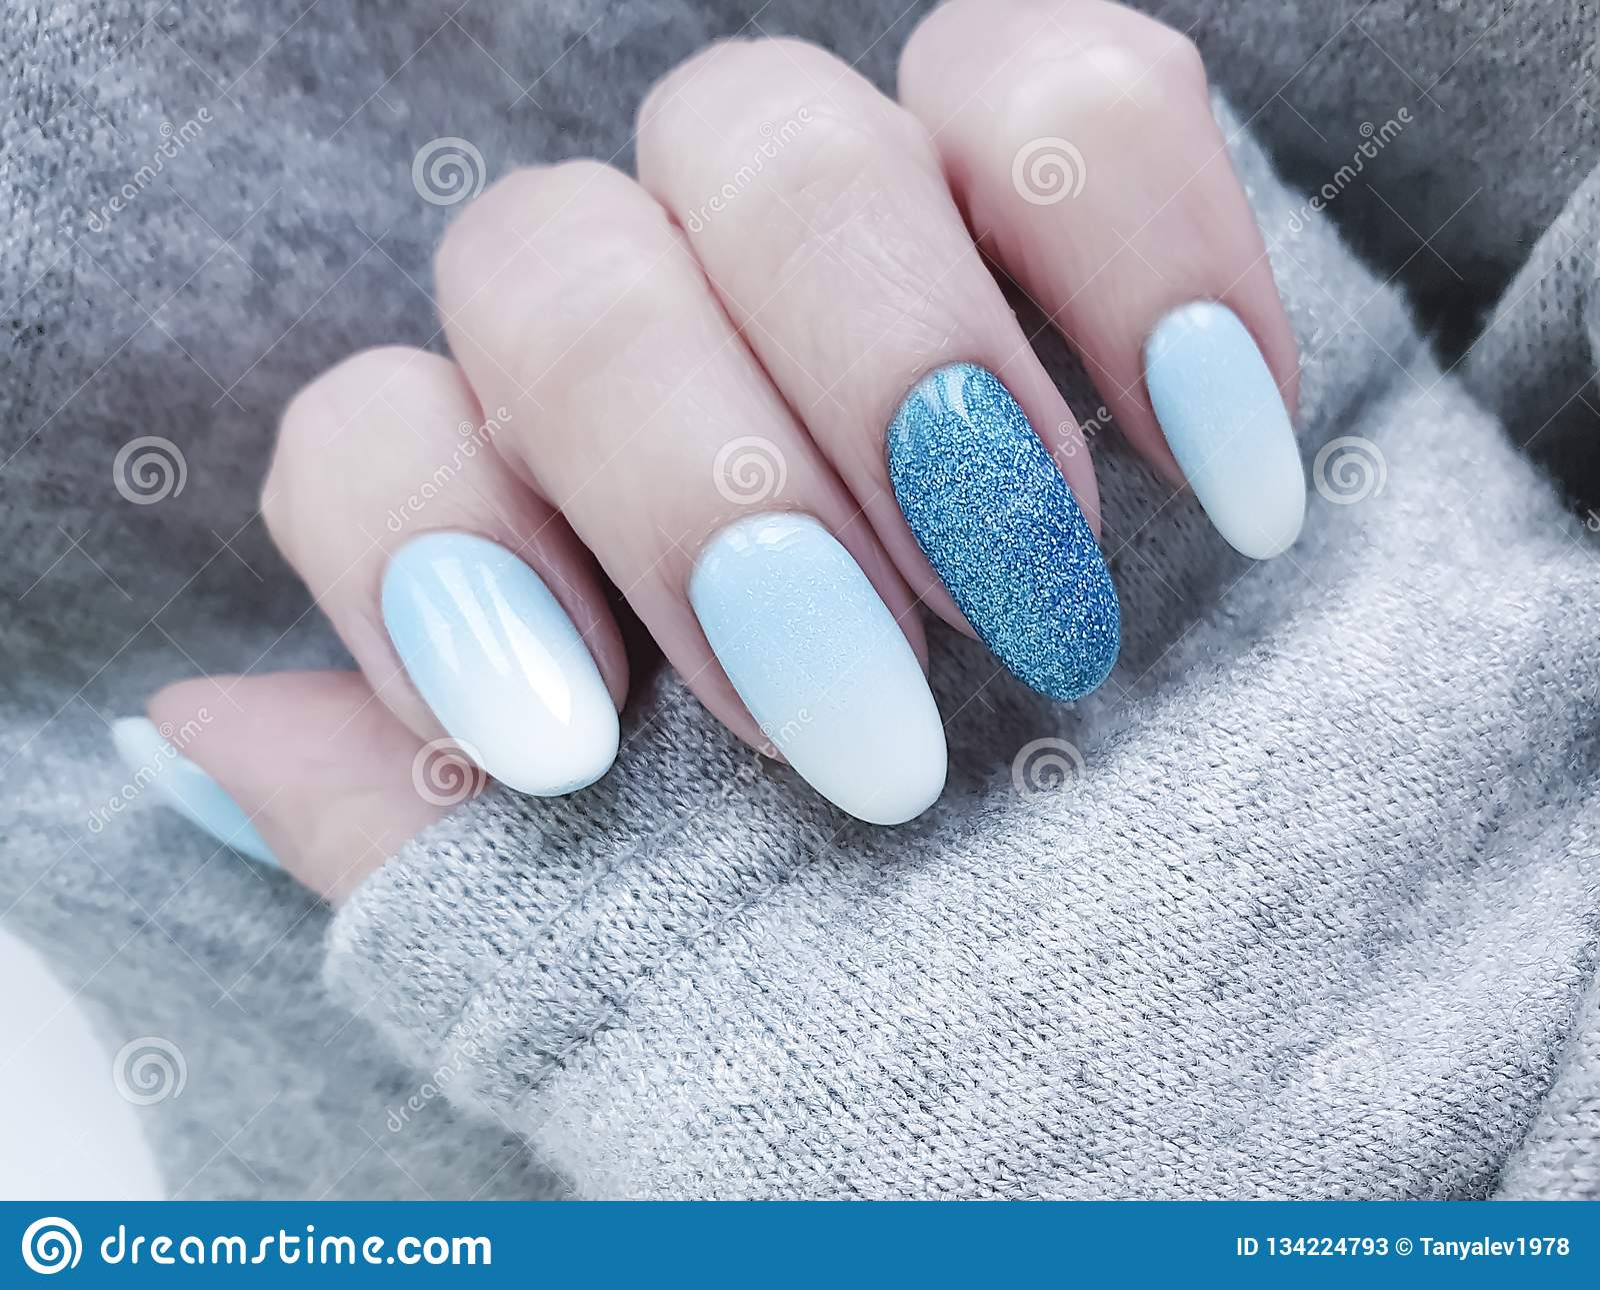 Female Hand Beautiful Fashion Blue Design Stylish Ombre